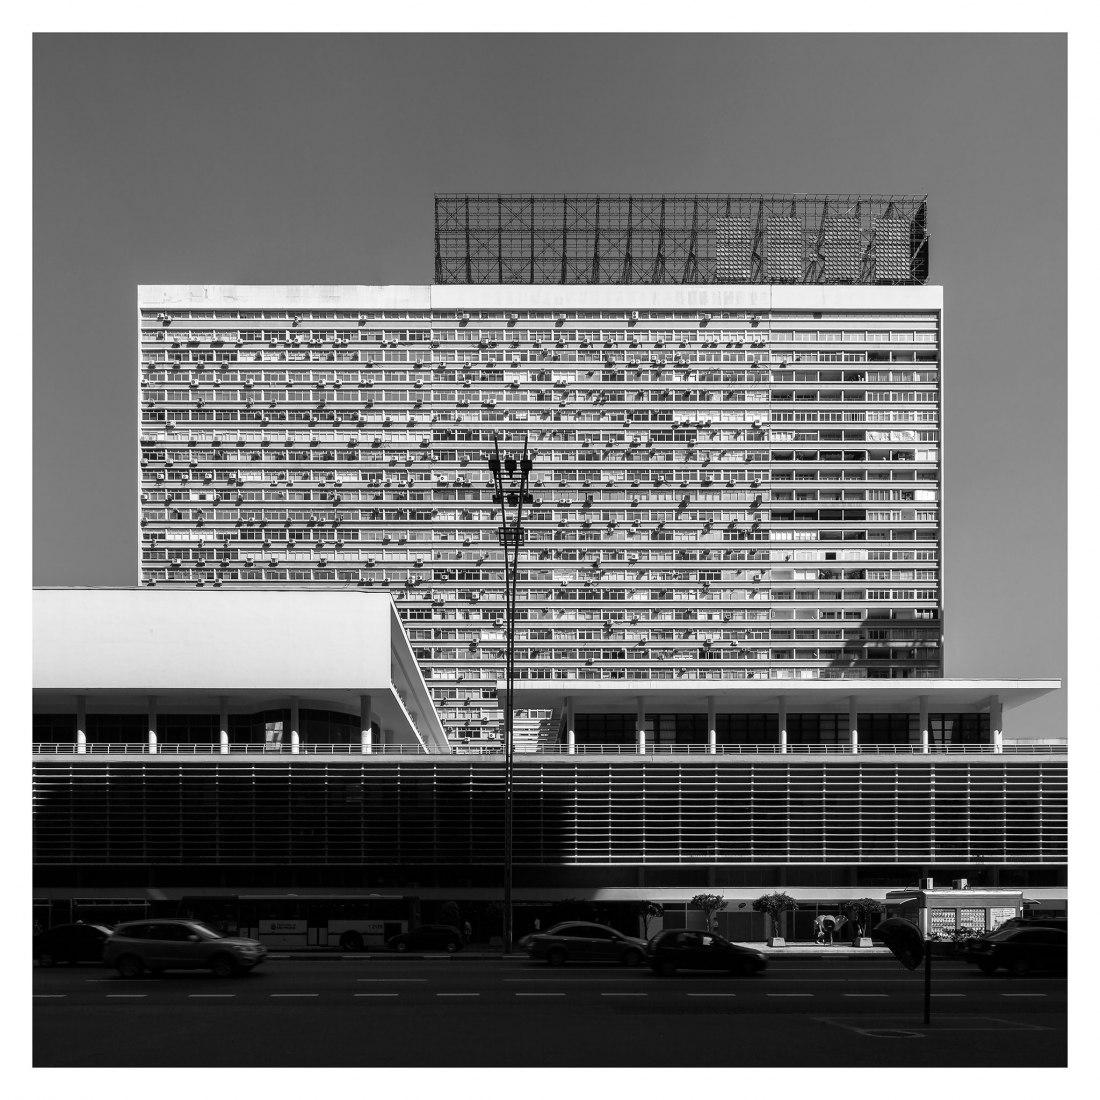 Bauhaus inflections in São Paulo series by Leonardo Finotti